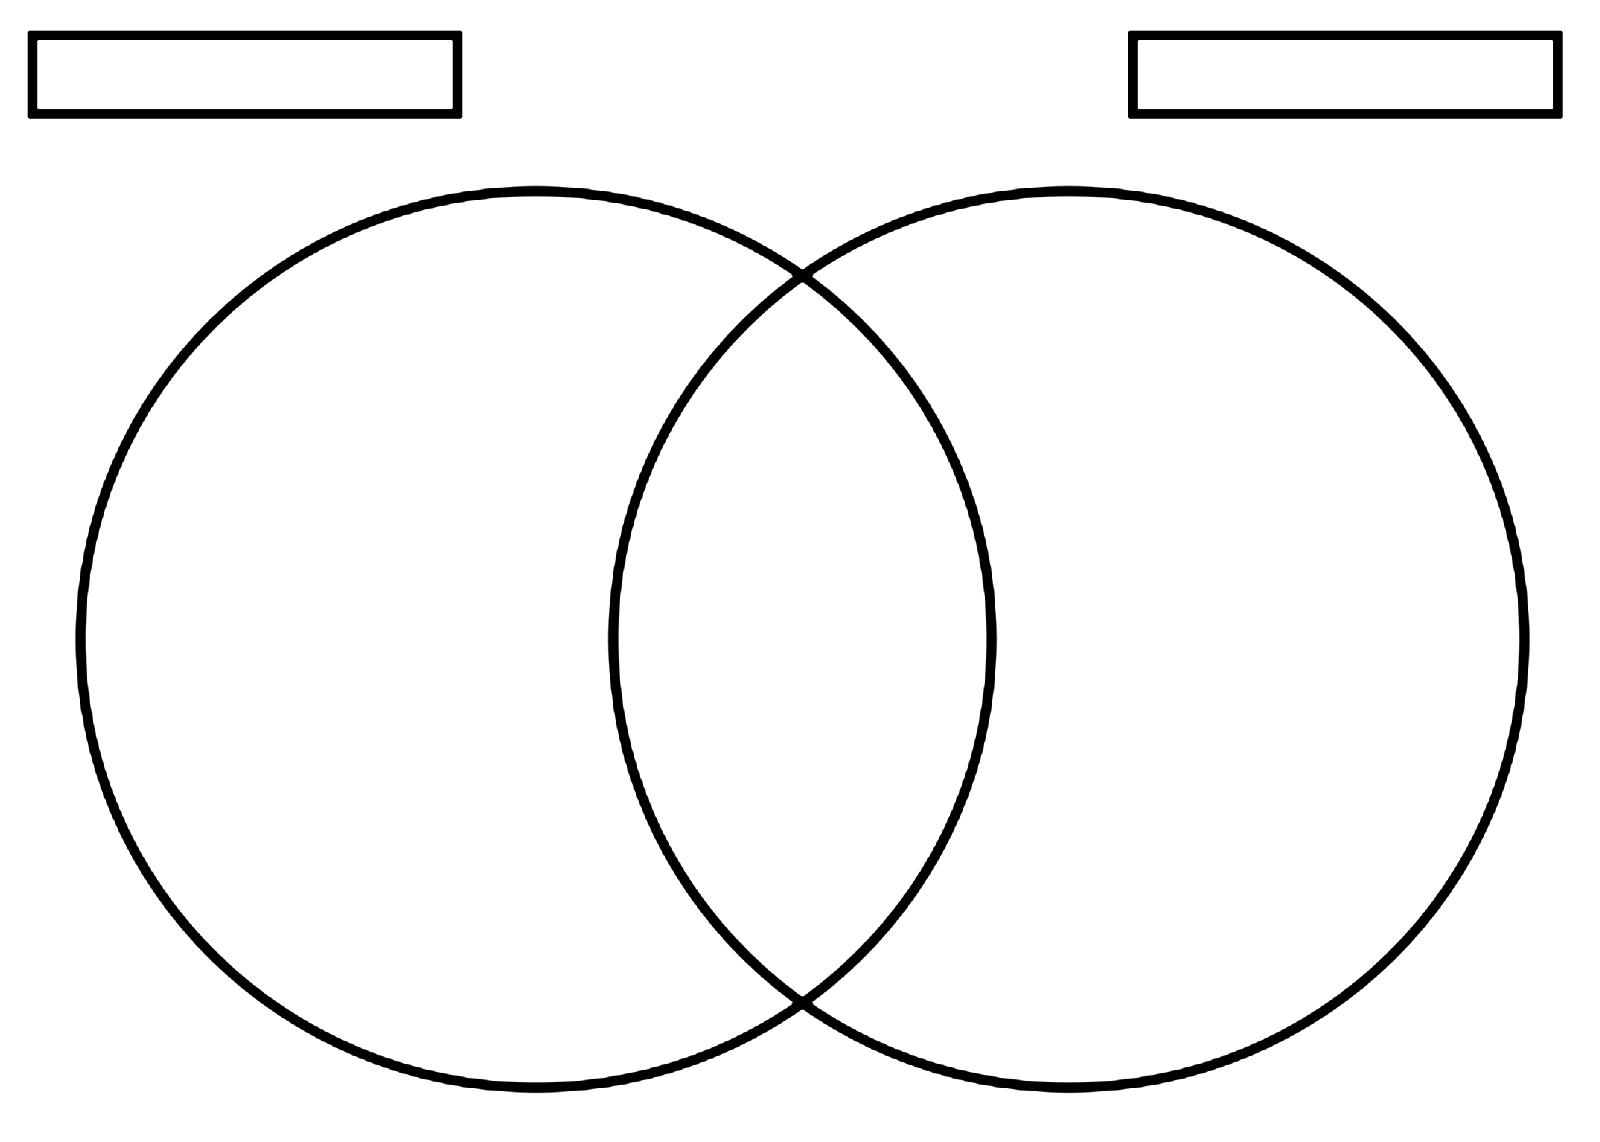 Venn Diagram Template - 40+ Free Venn Diagram Templates ...